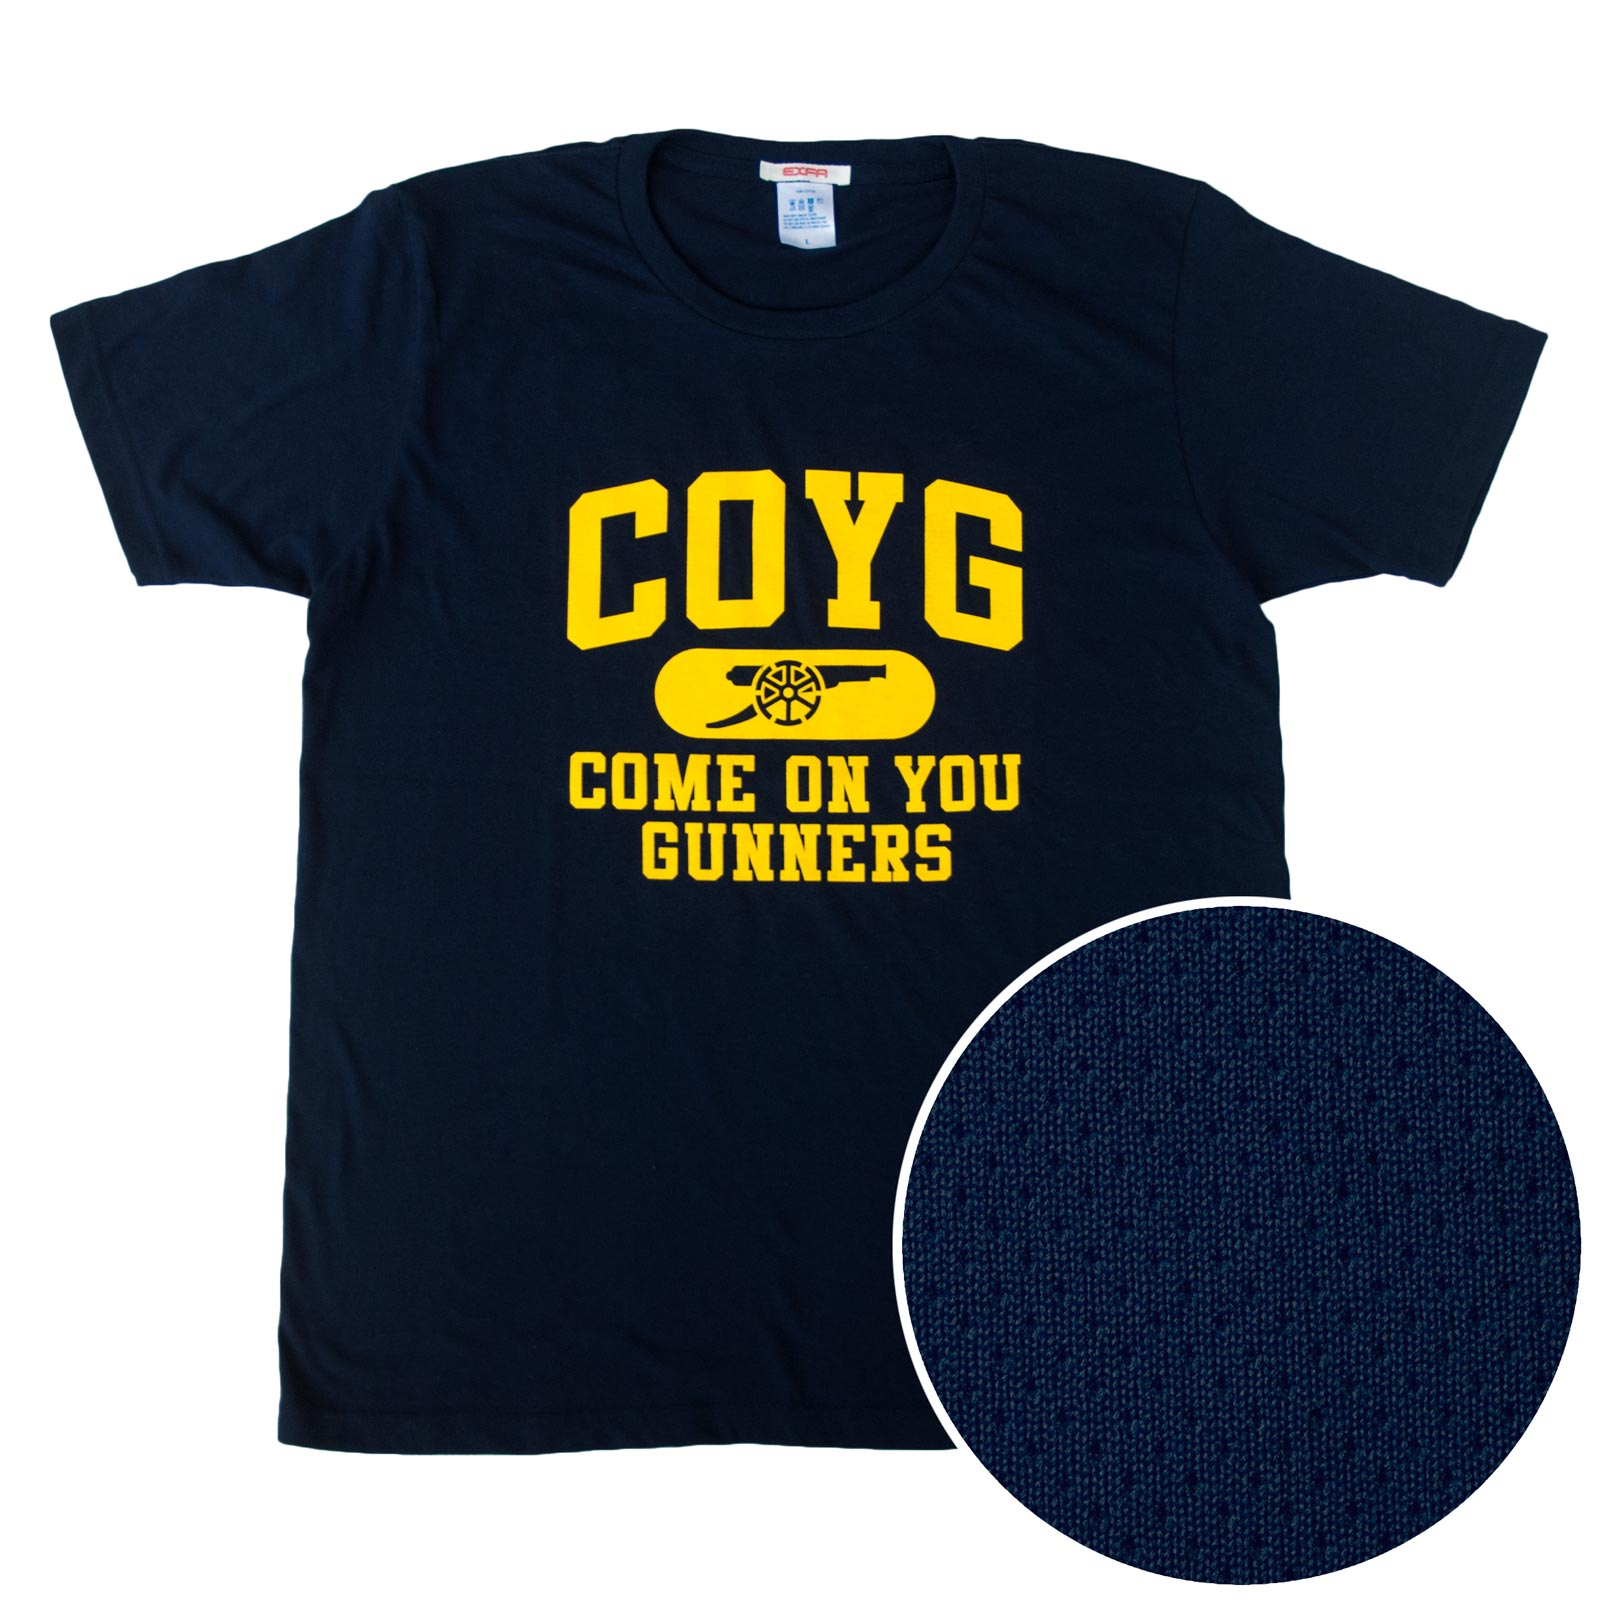 COYG ドライTシャツ